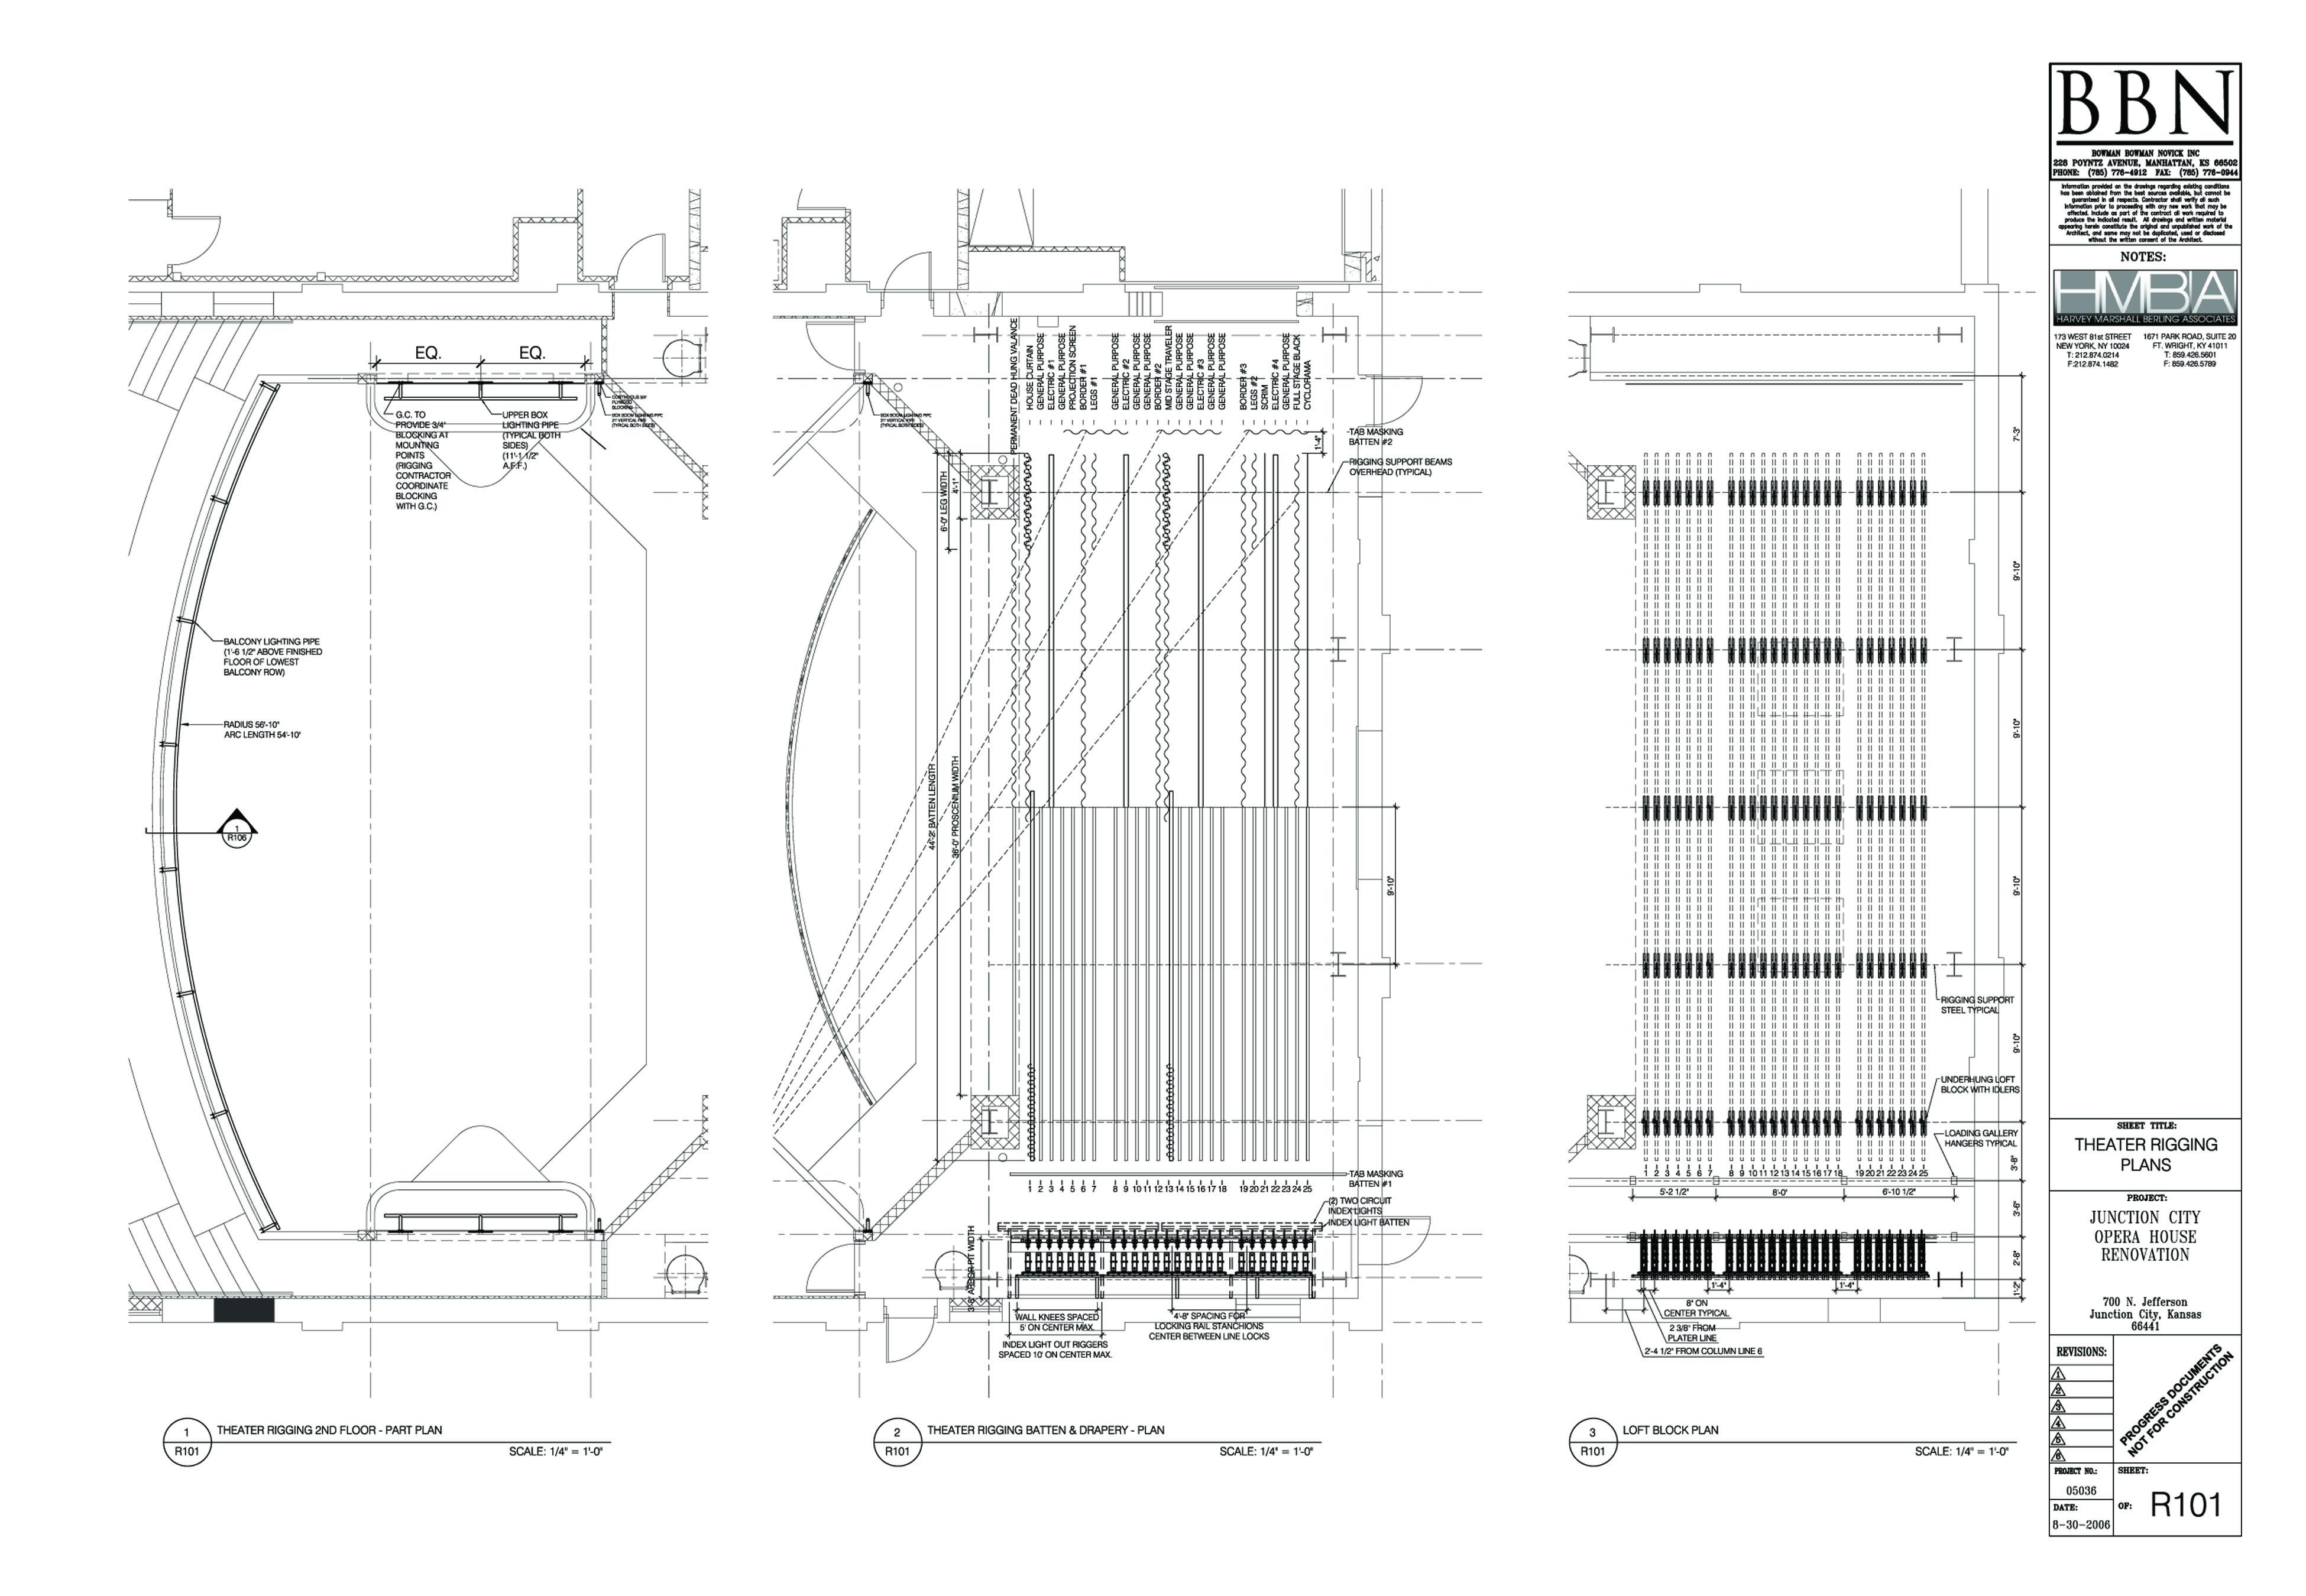 Michael Kraczek Theatre Design Page 4 Lighting Diagram Theater Rigging Plans